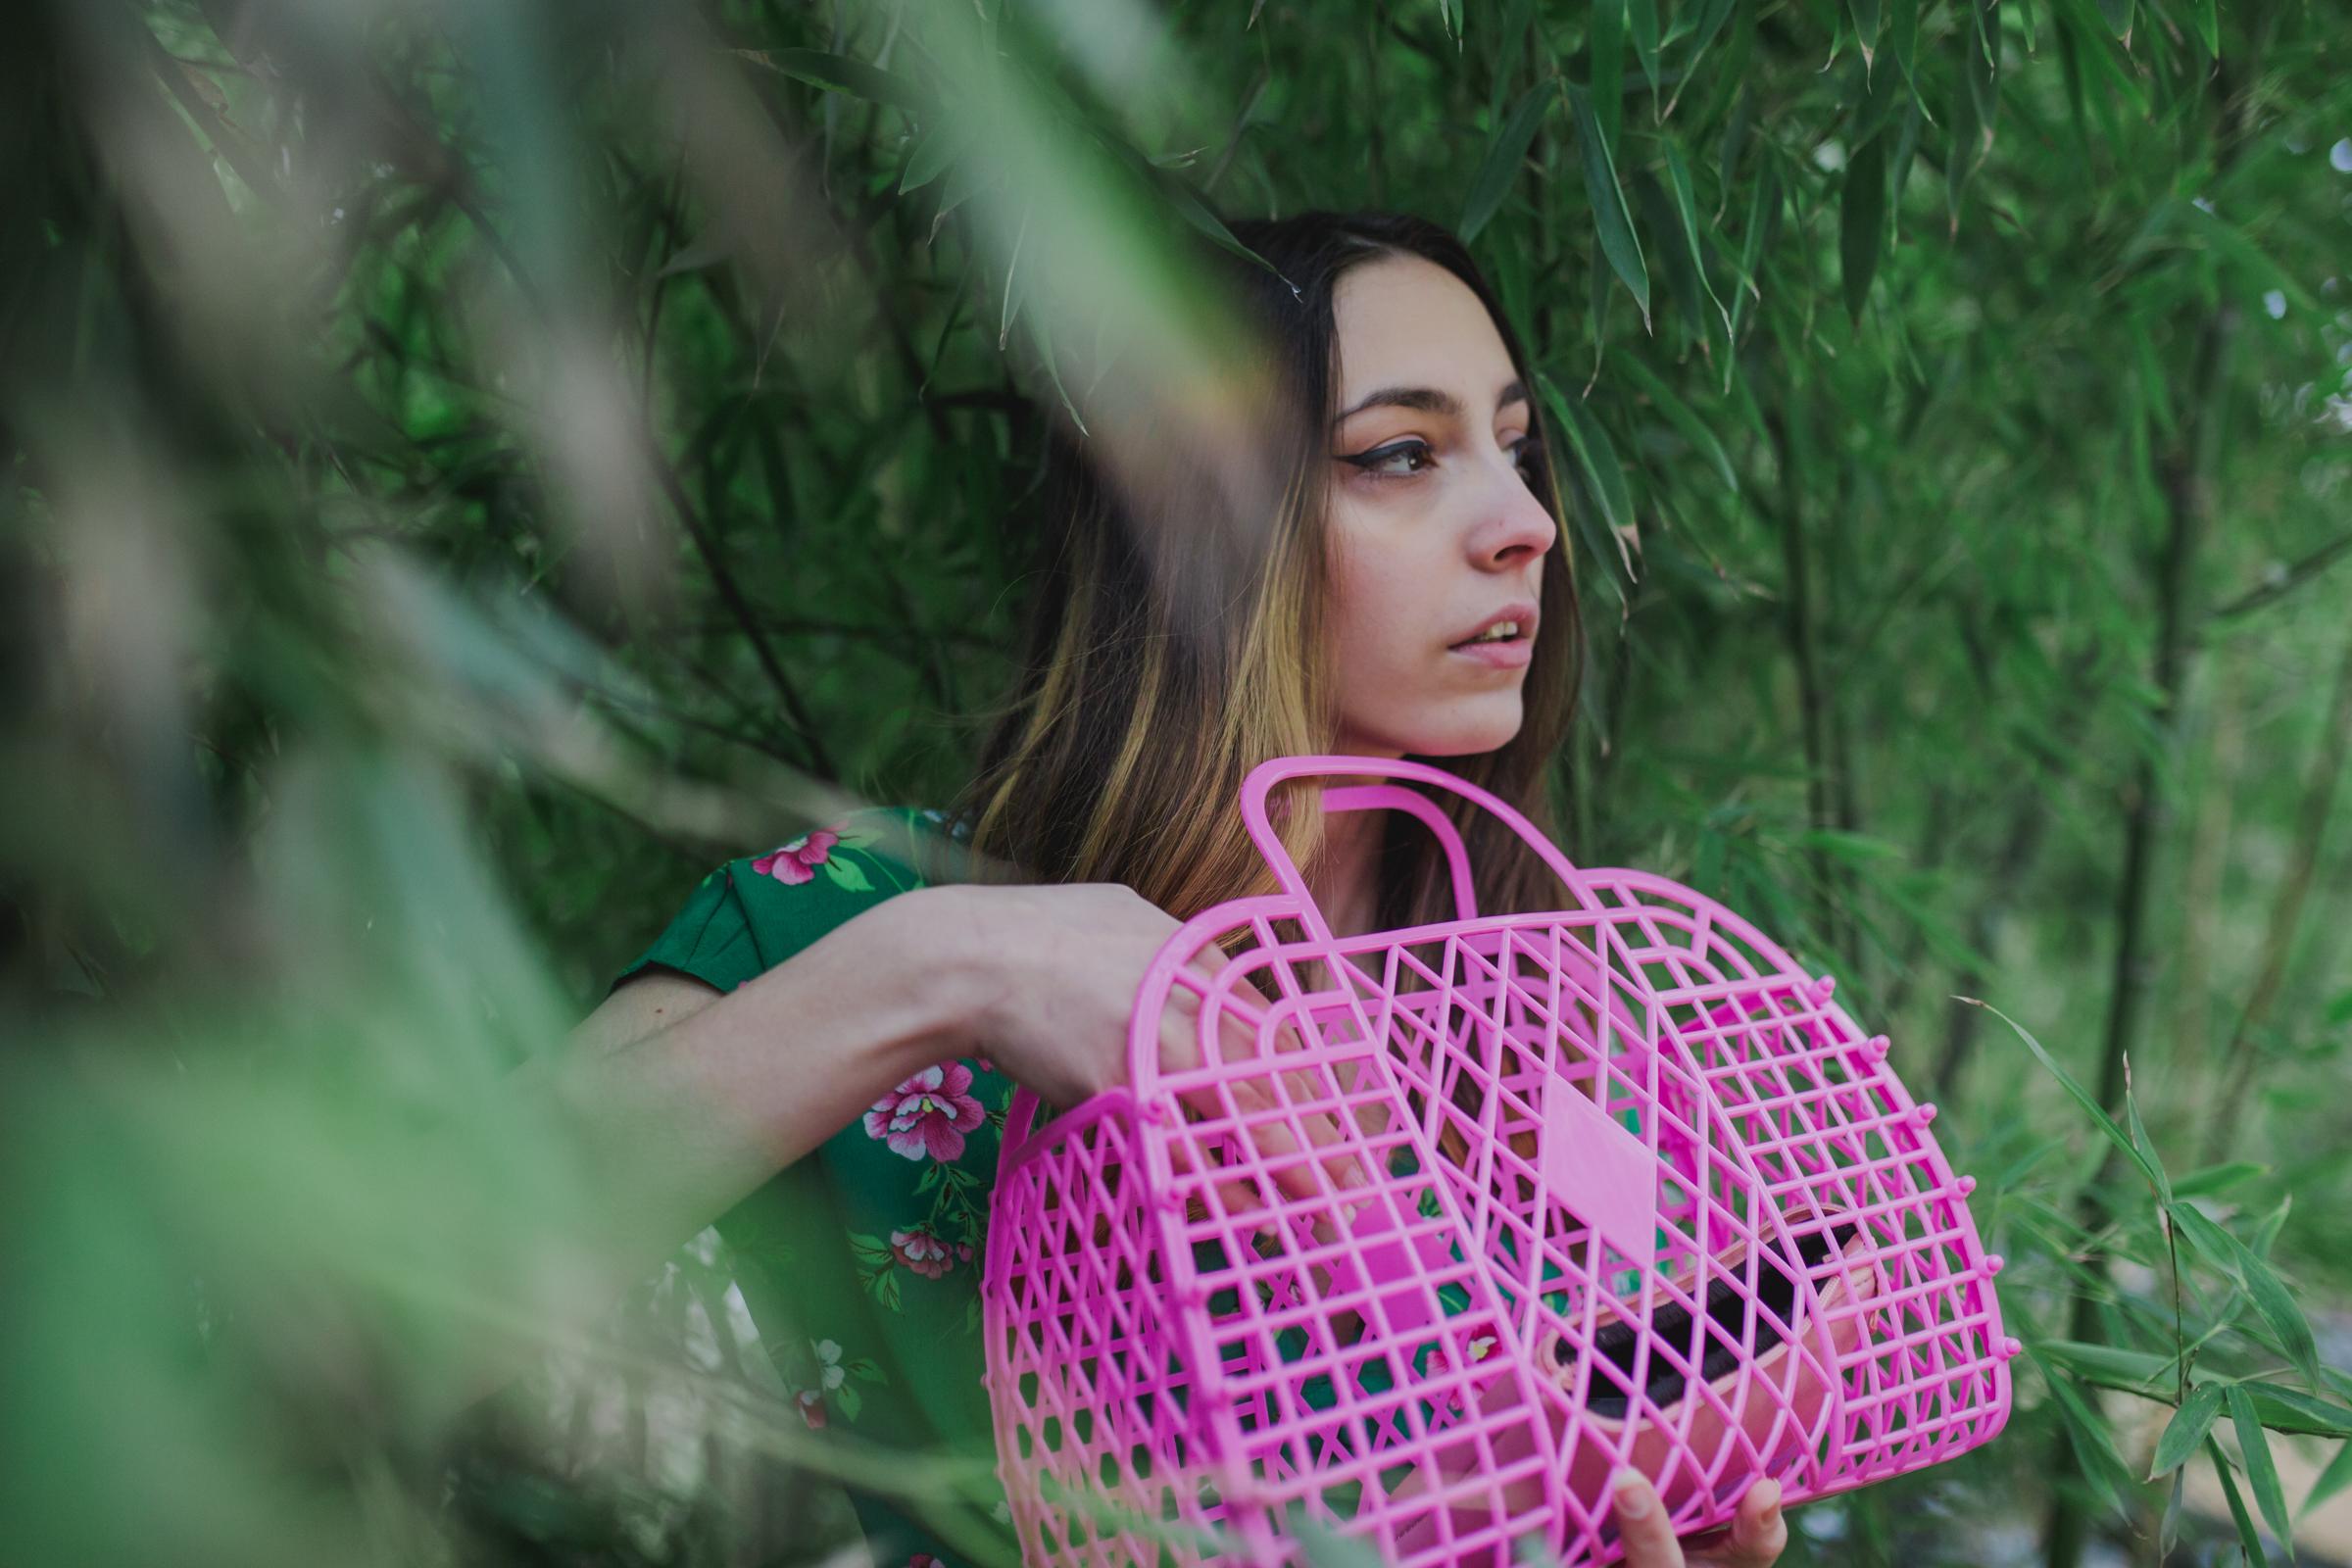 fashion-photographer-london-fashionstory-jasmina-haskovic-minas-planet-uk2.jpg